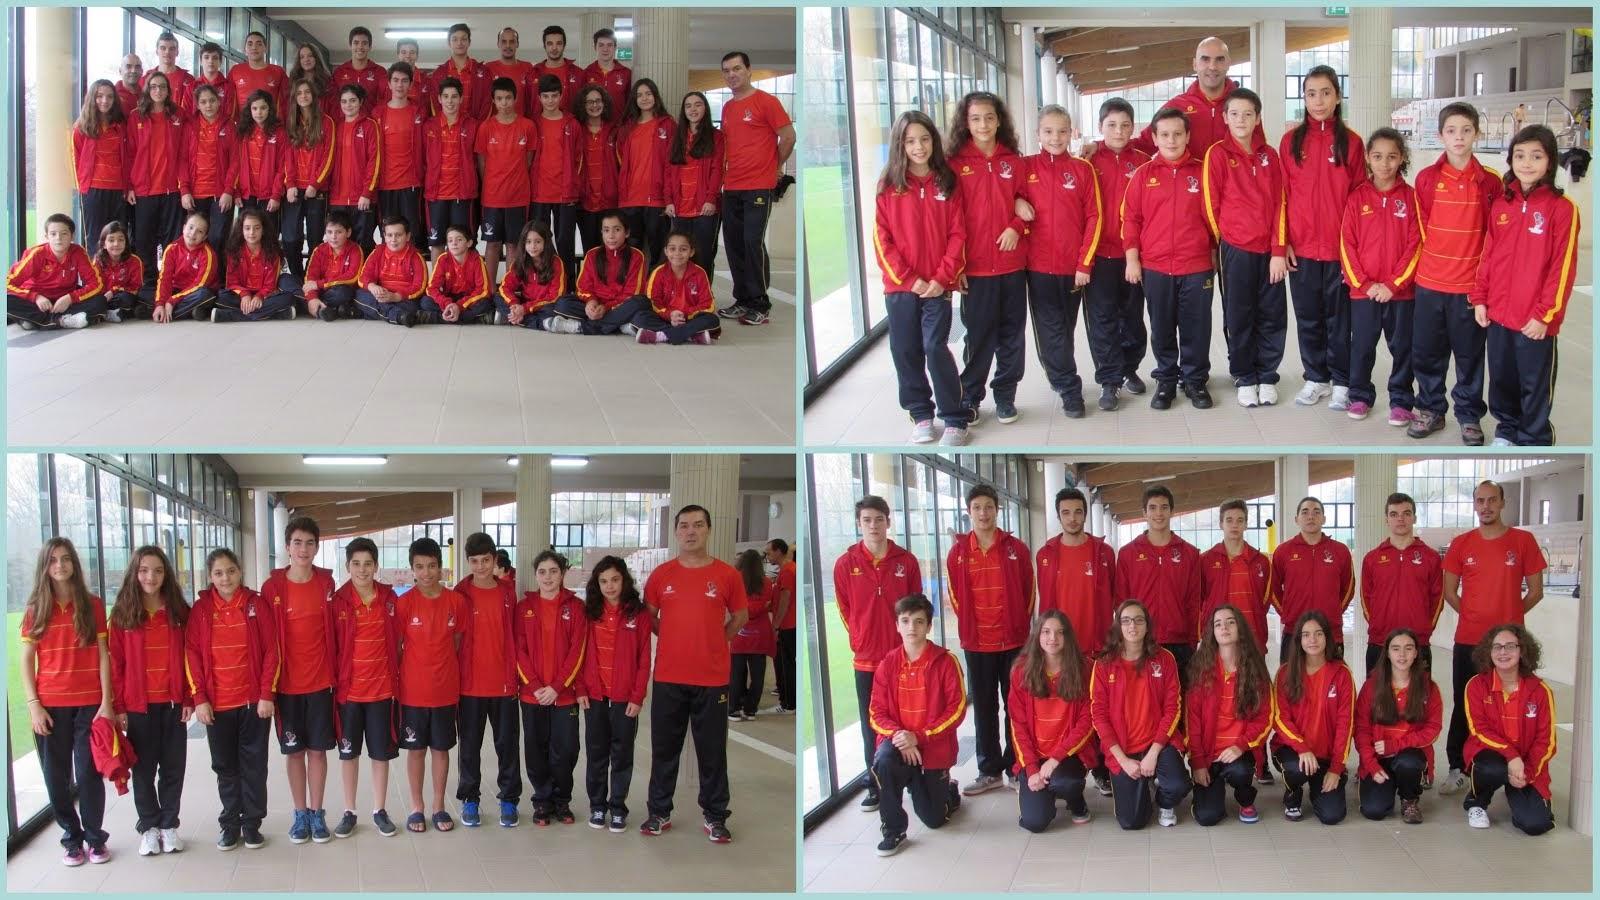 Equipa Época 2014/2015